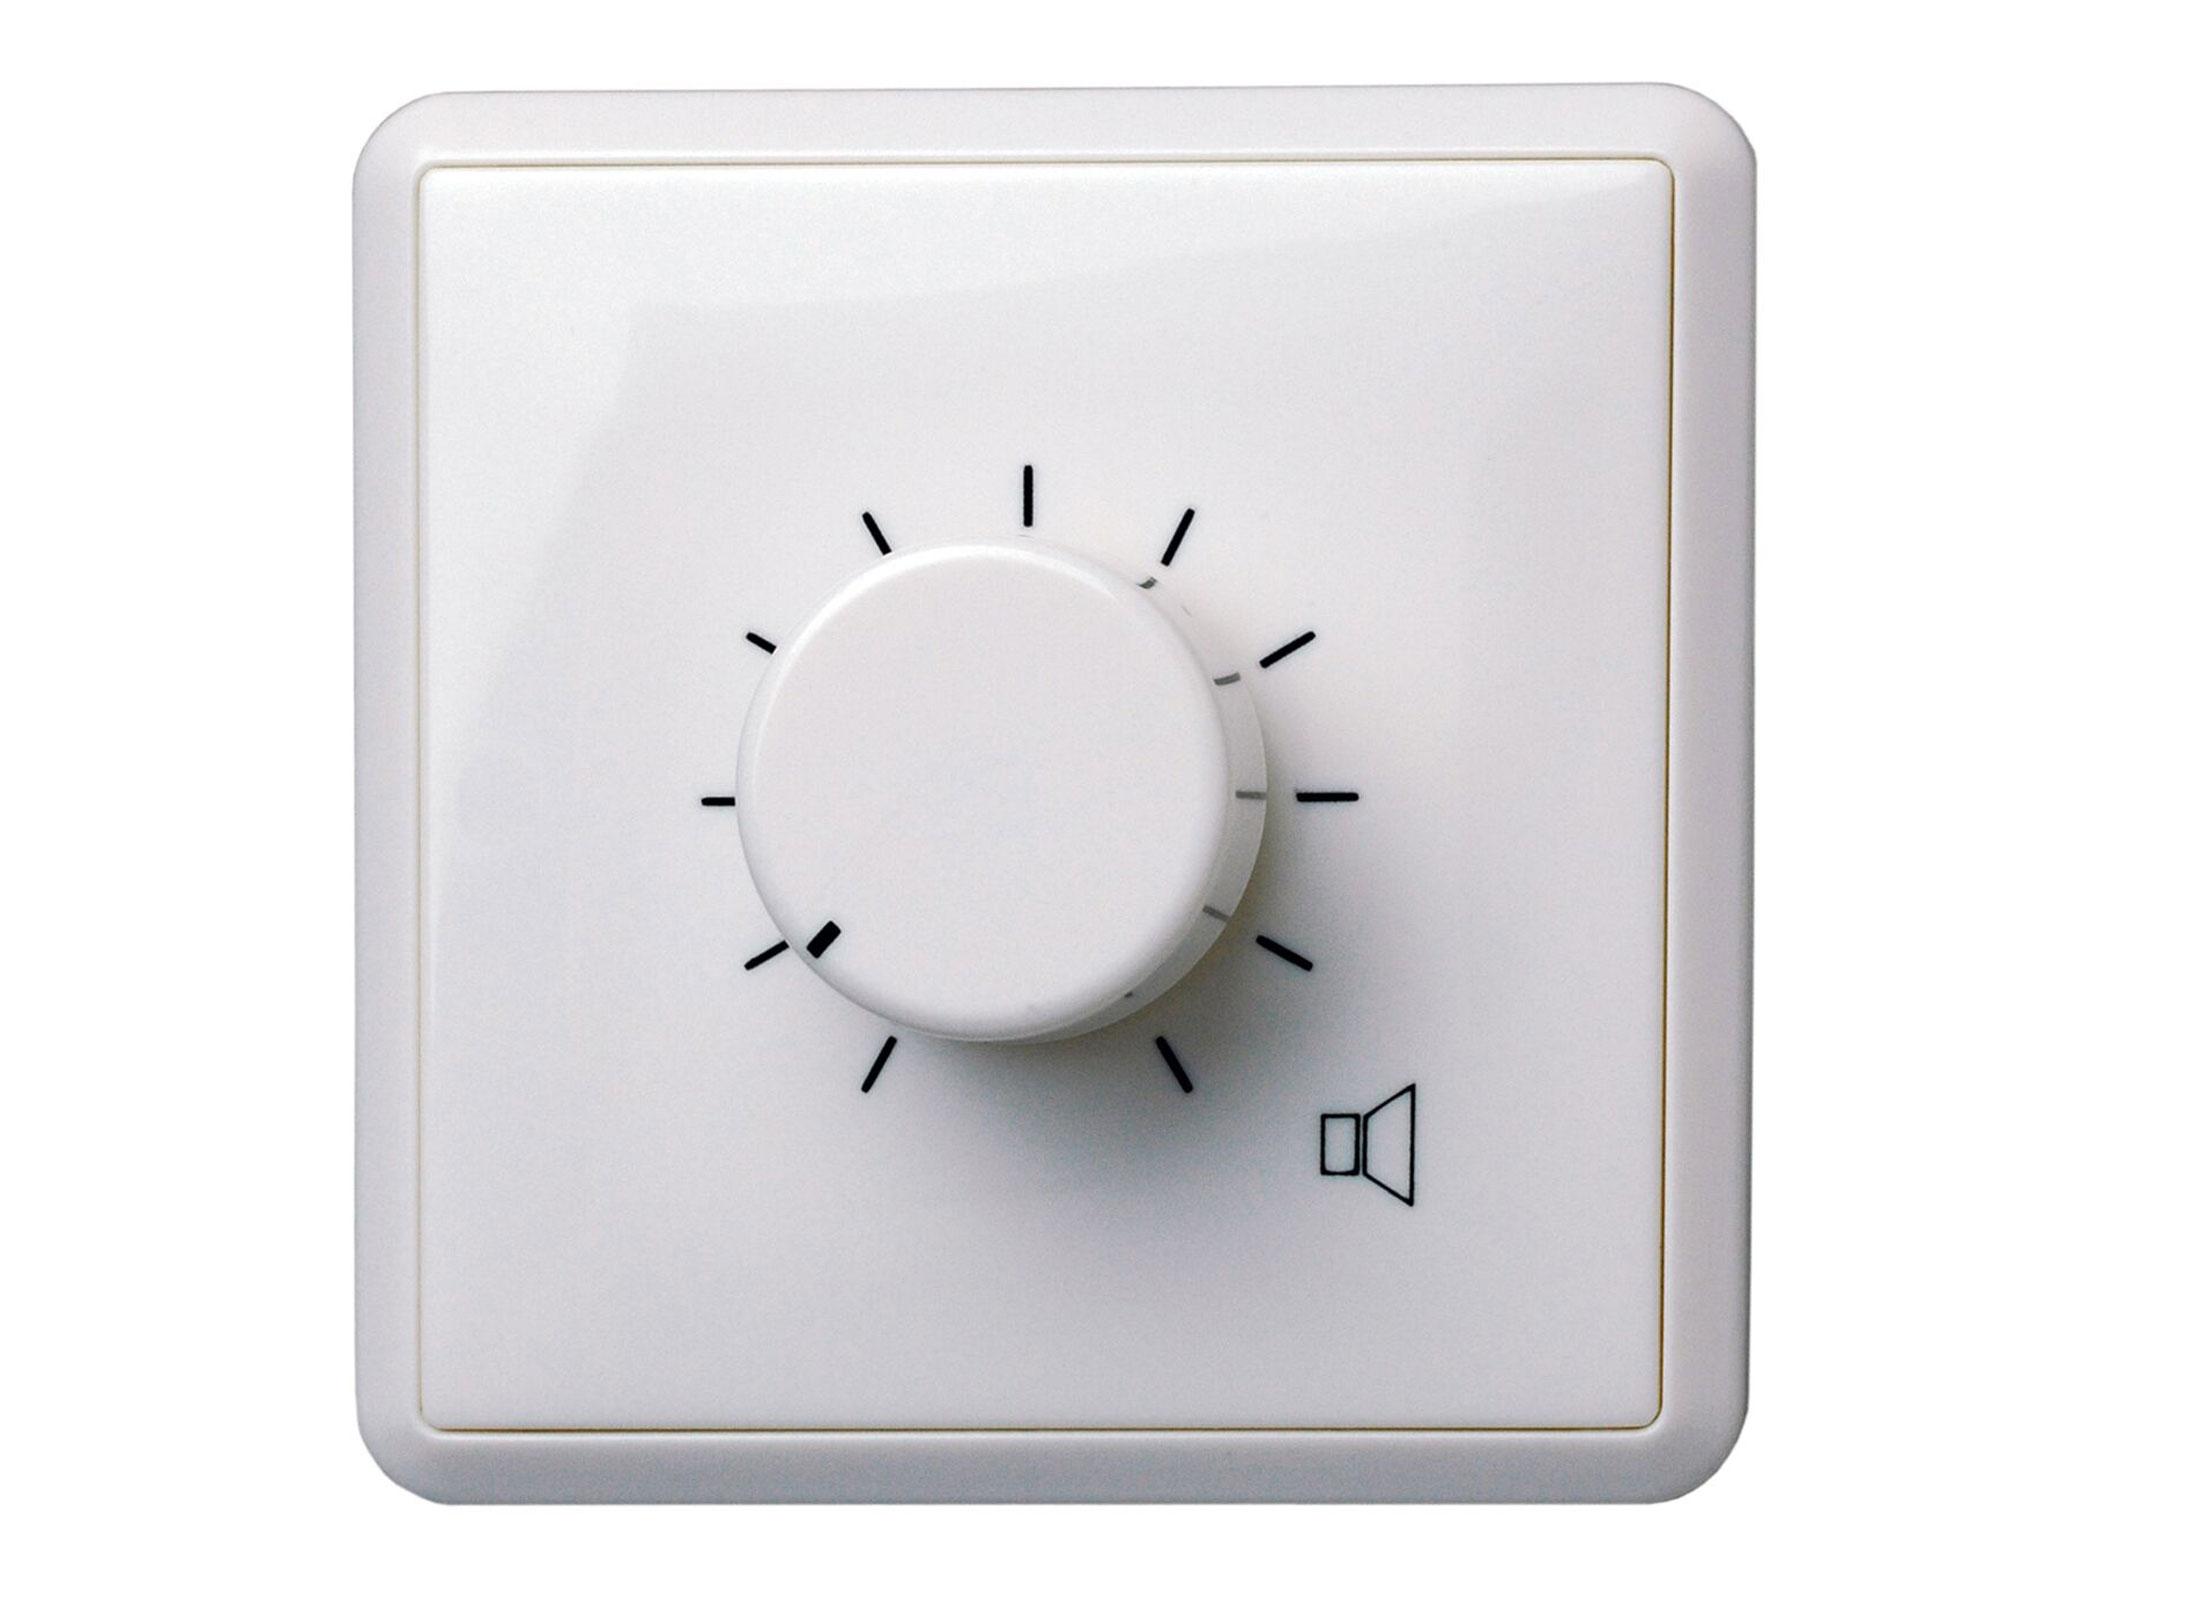 Volume Sound Control Panel : Apart audio e vol wall panel volume control white